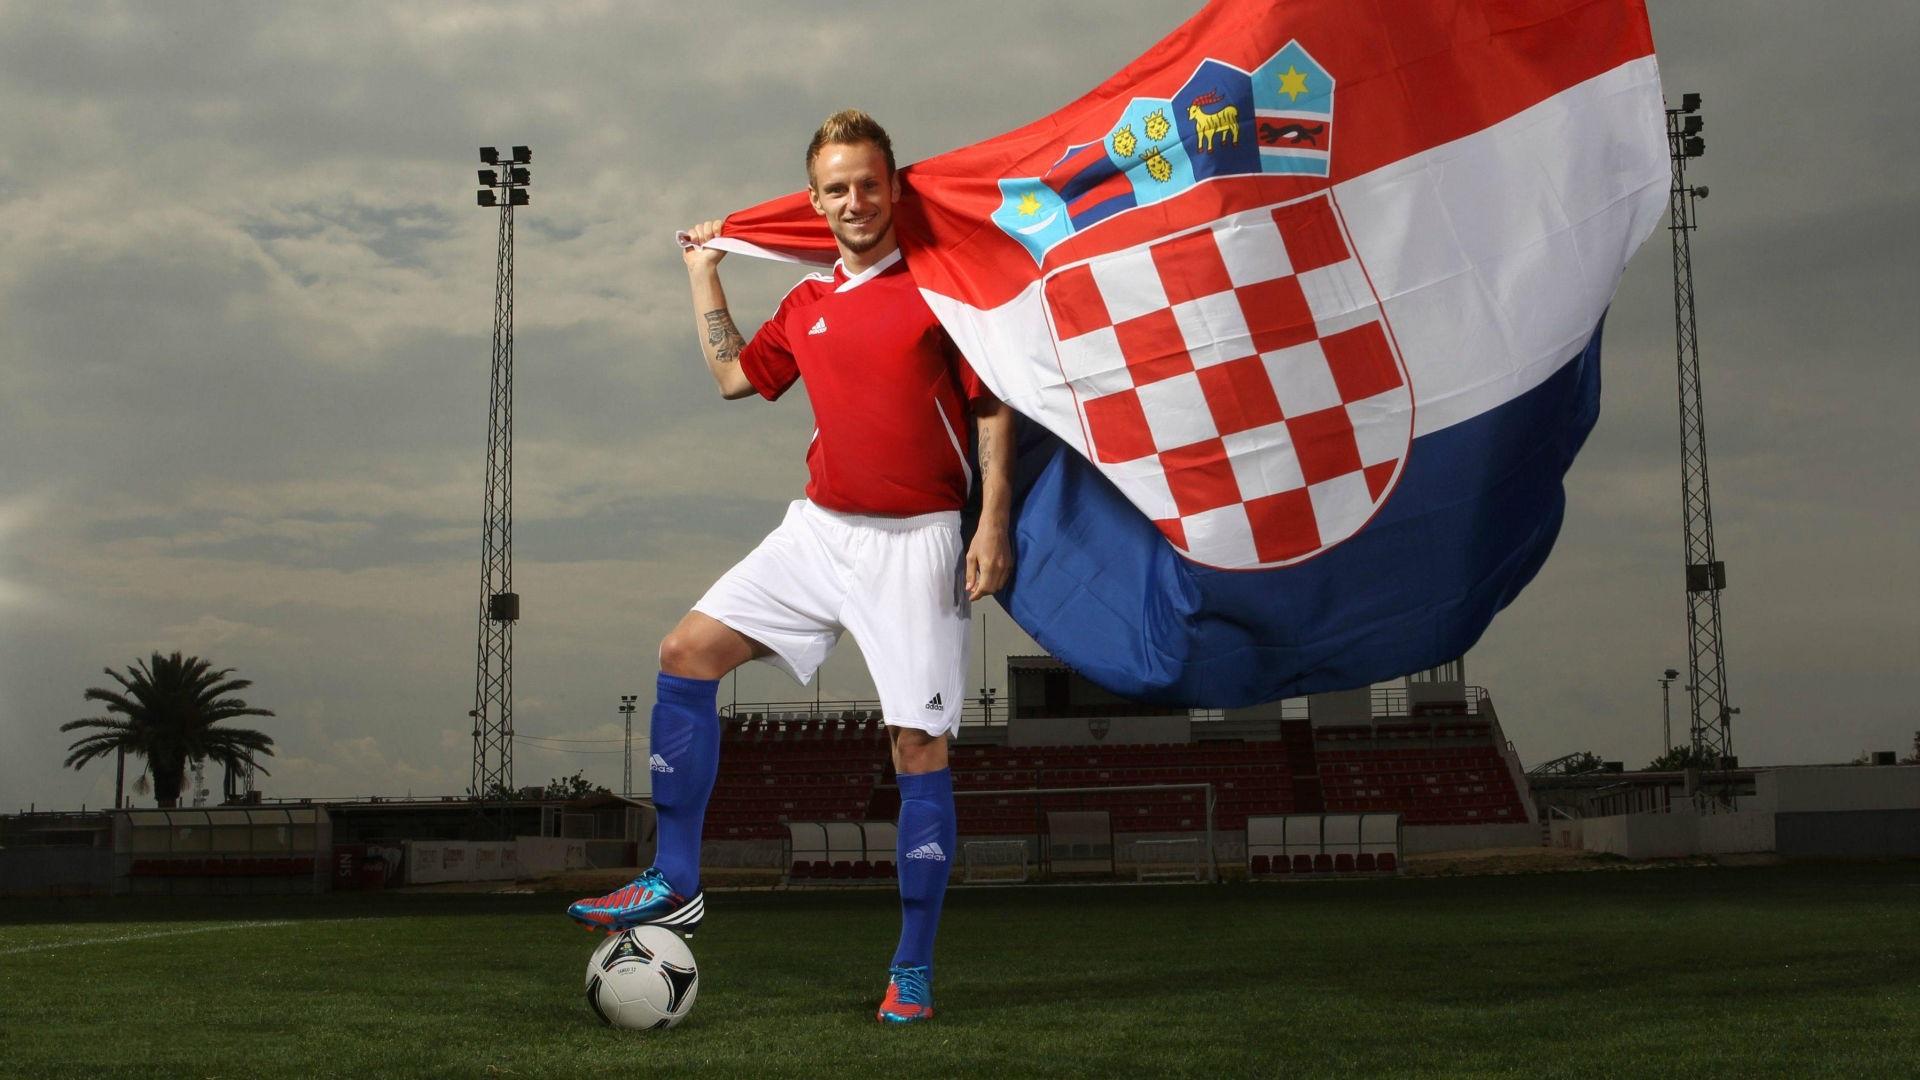 Croatia National Football Team Wallpapers